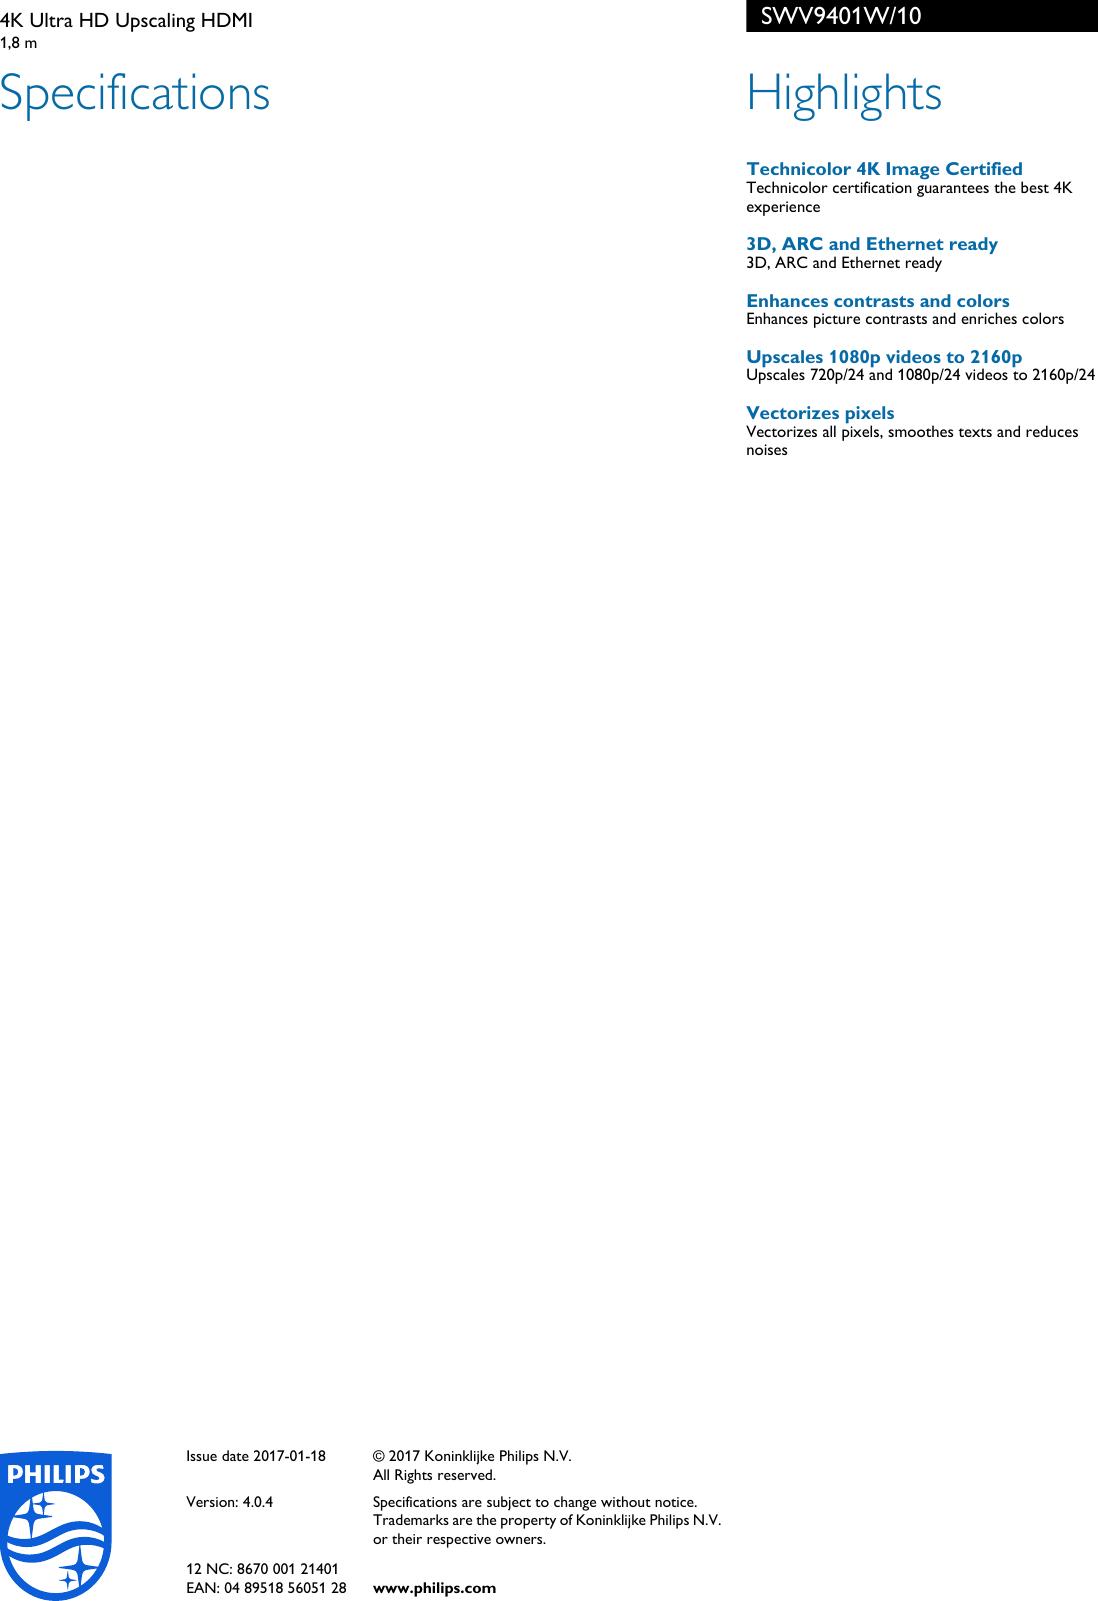 Philips SWV9401W/10 4K Ultra HD Upscaling HDMI User Manual